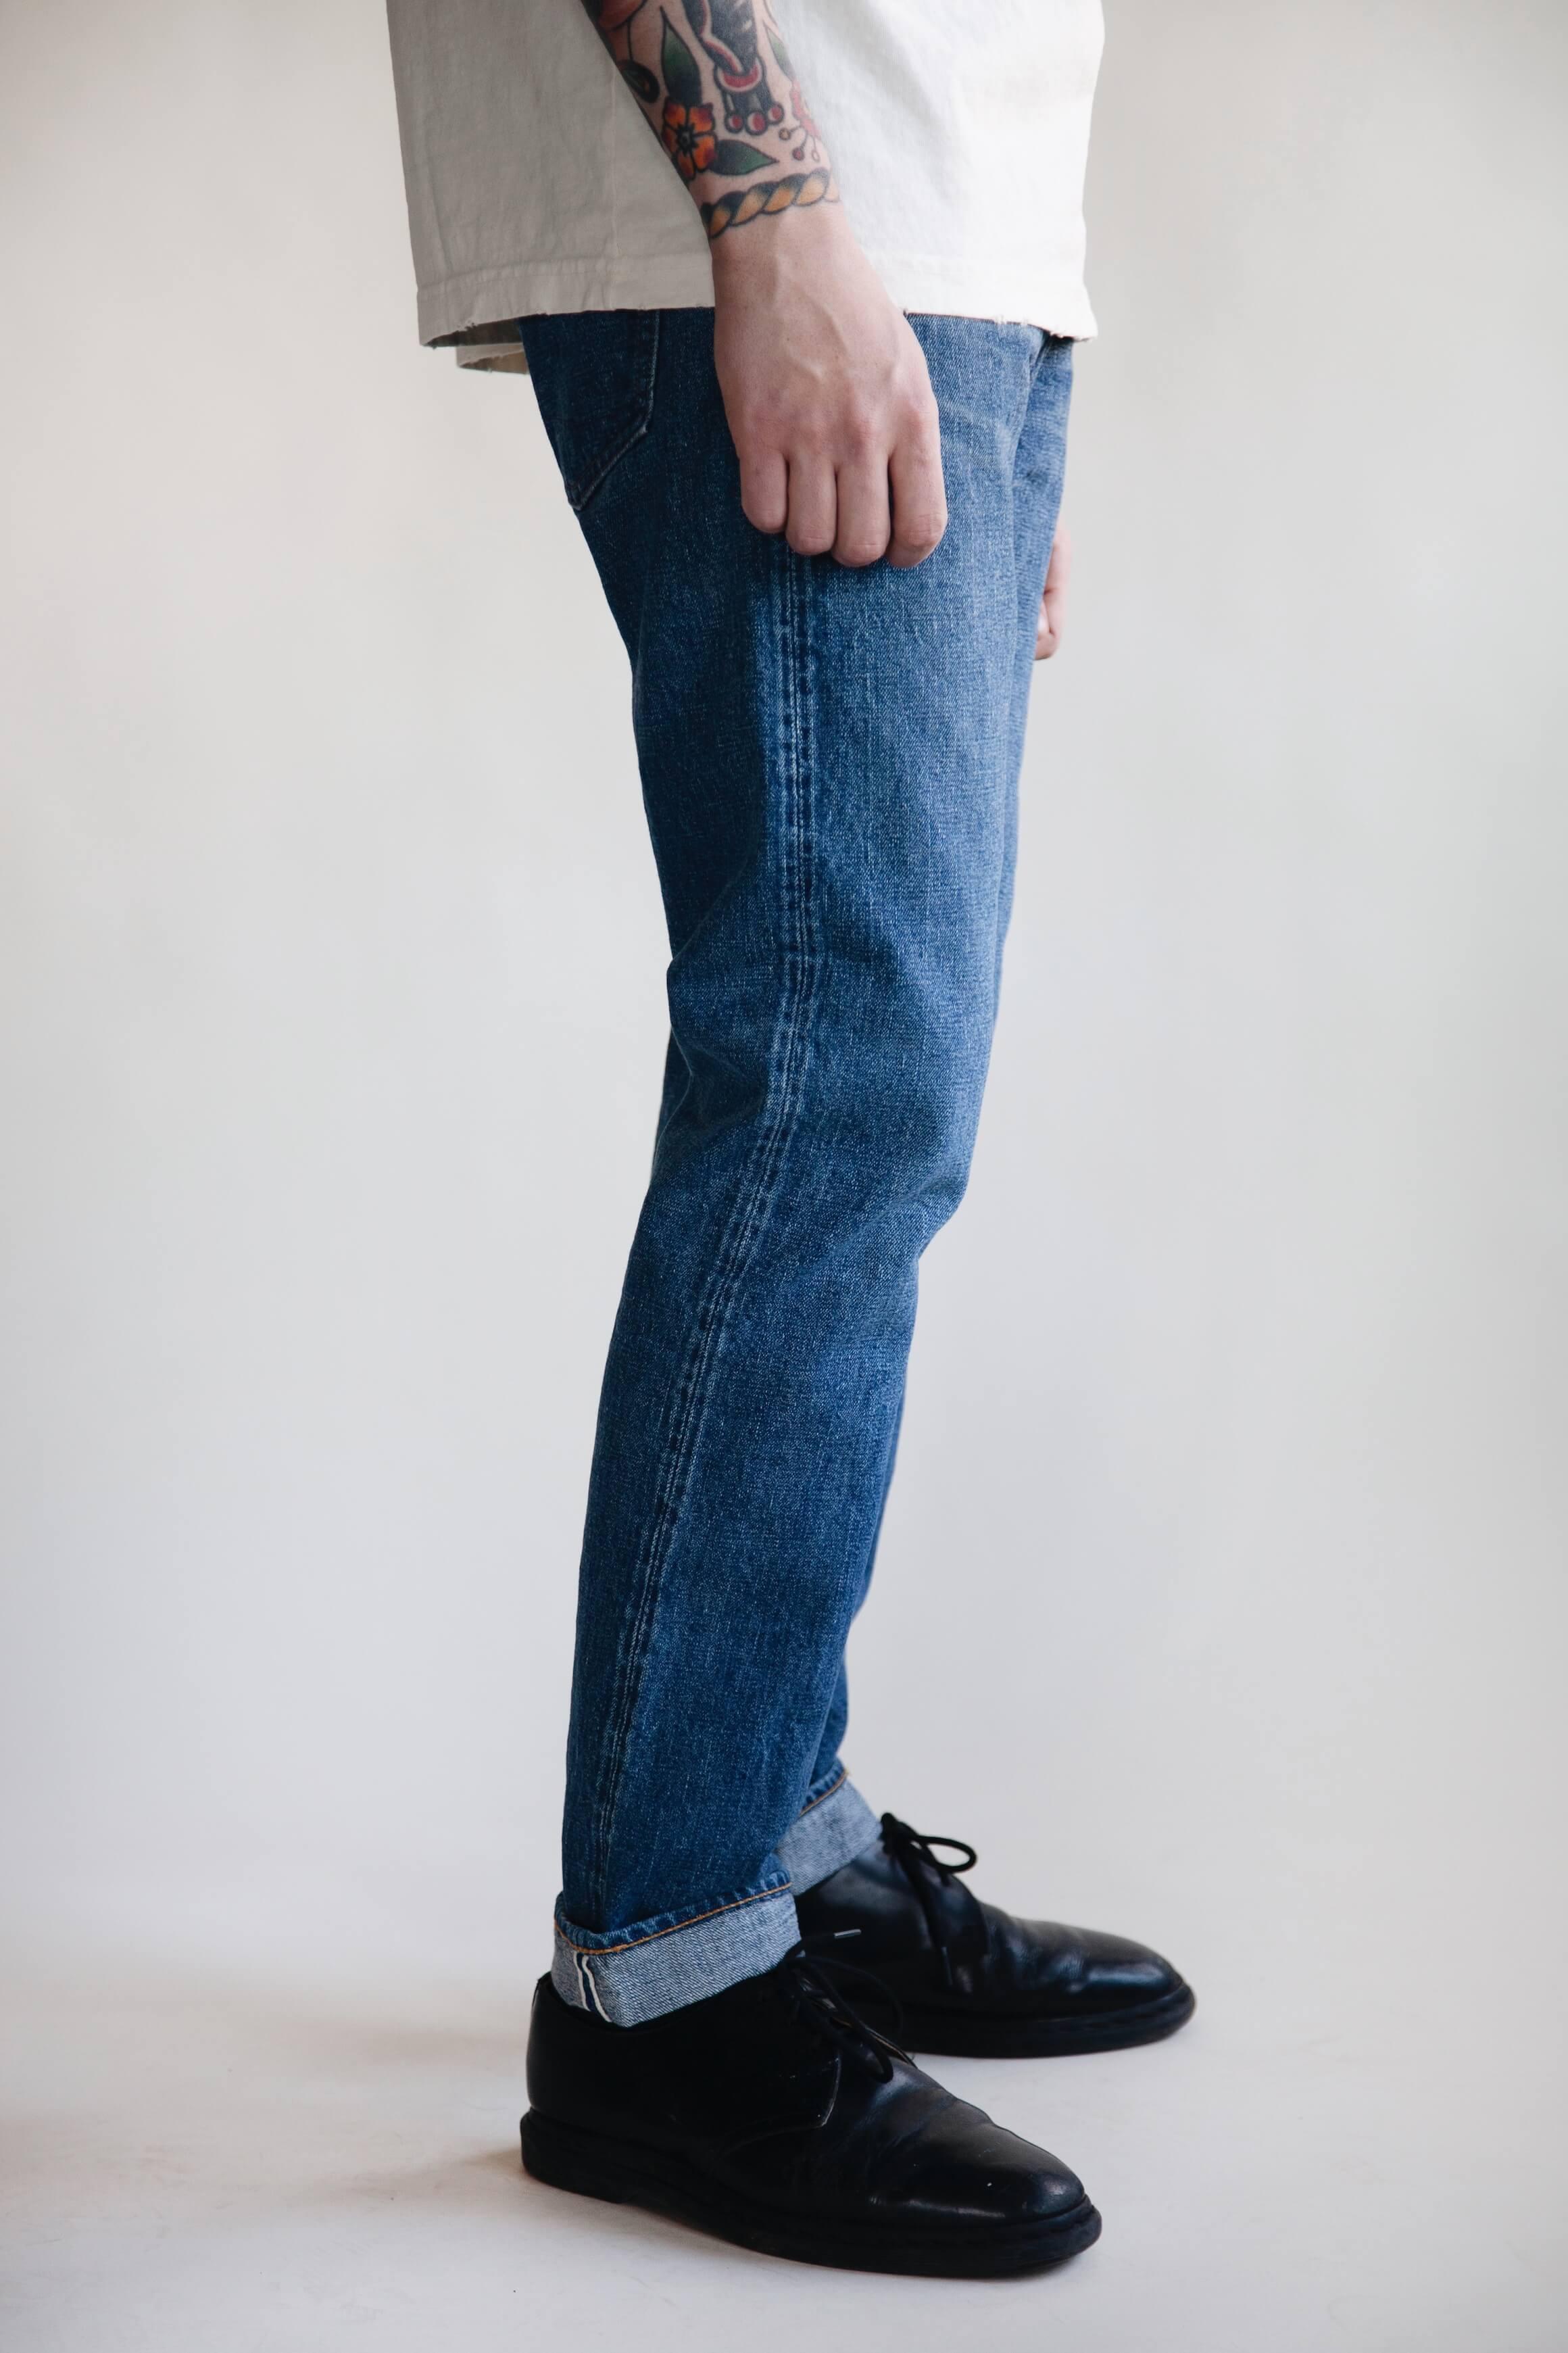 orslow 107 Ivy Denim - 2 year Wash on male model